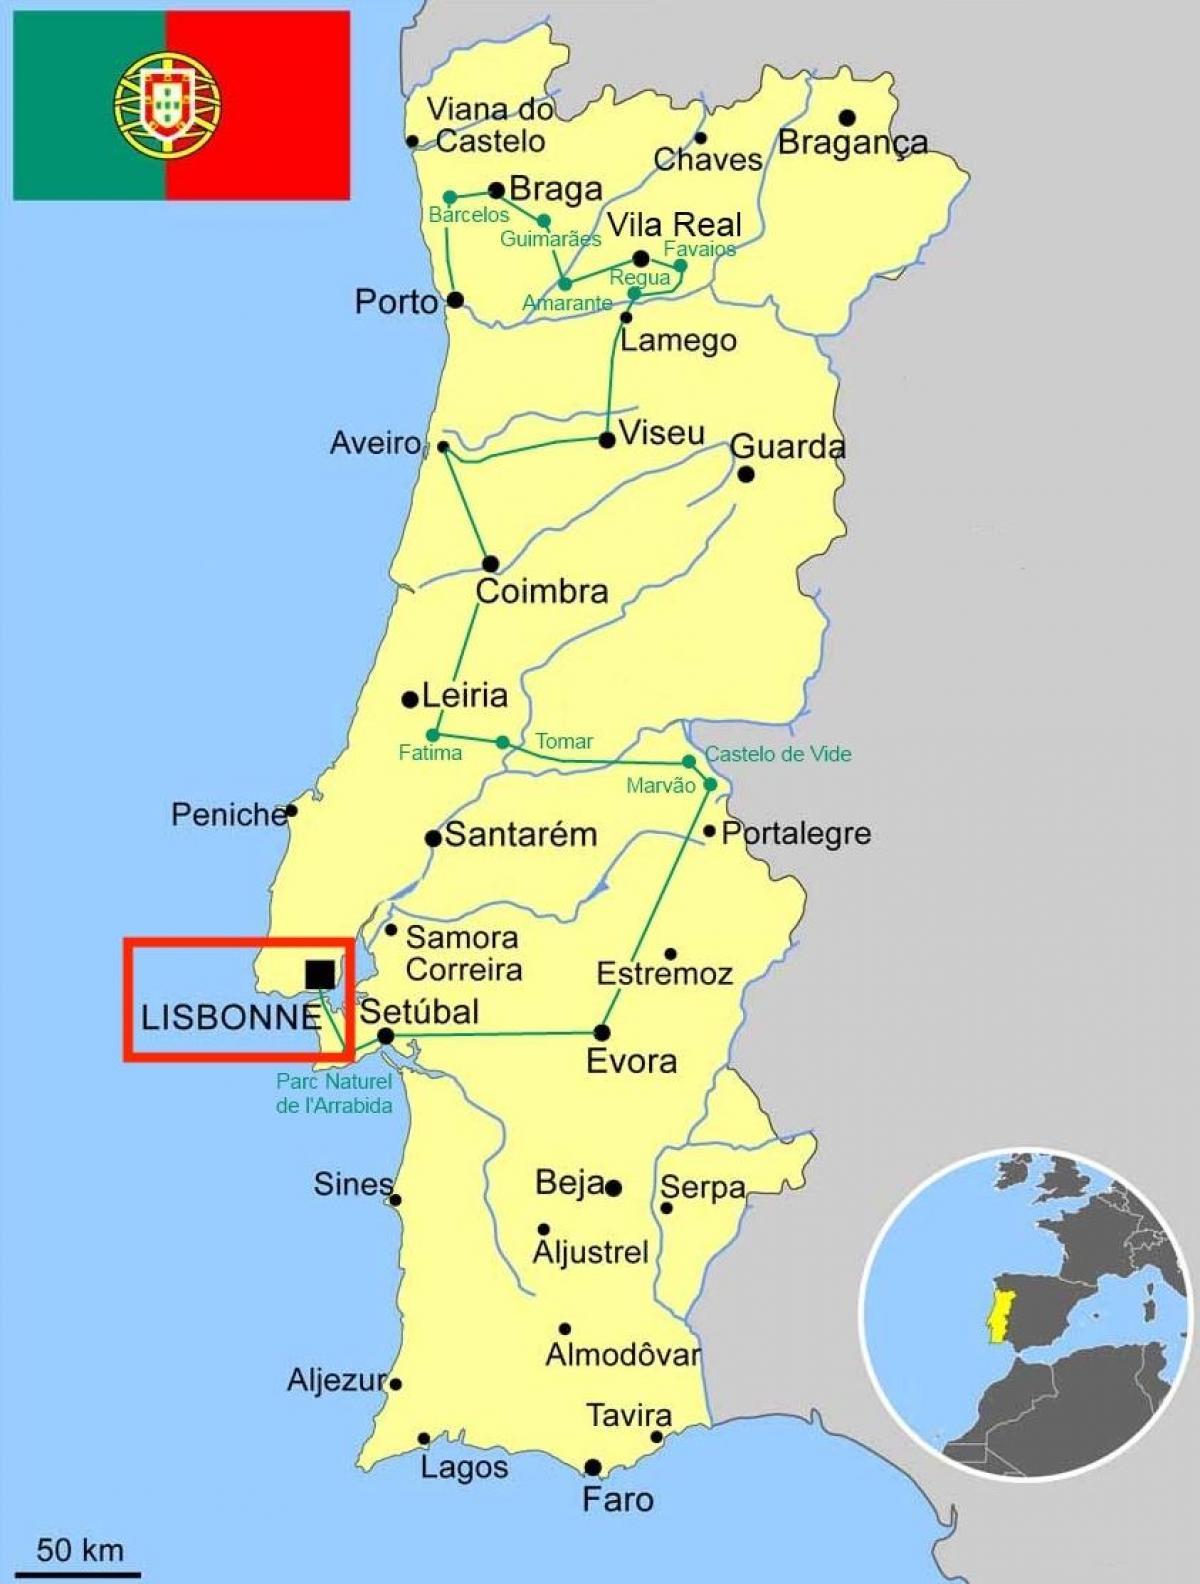 Lisbon portugal map - Lisboa portugal map (Portugal)